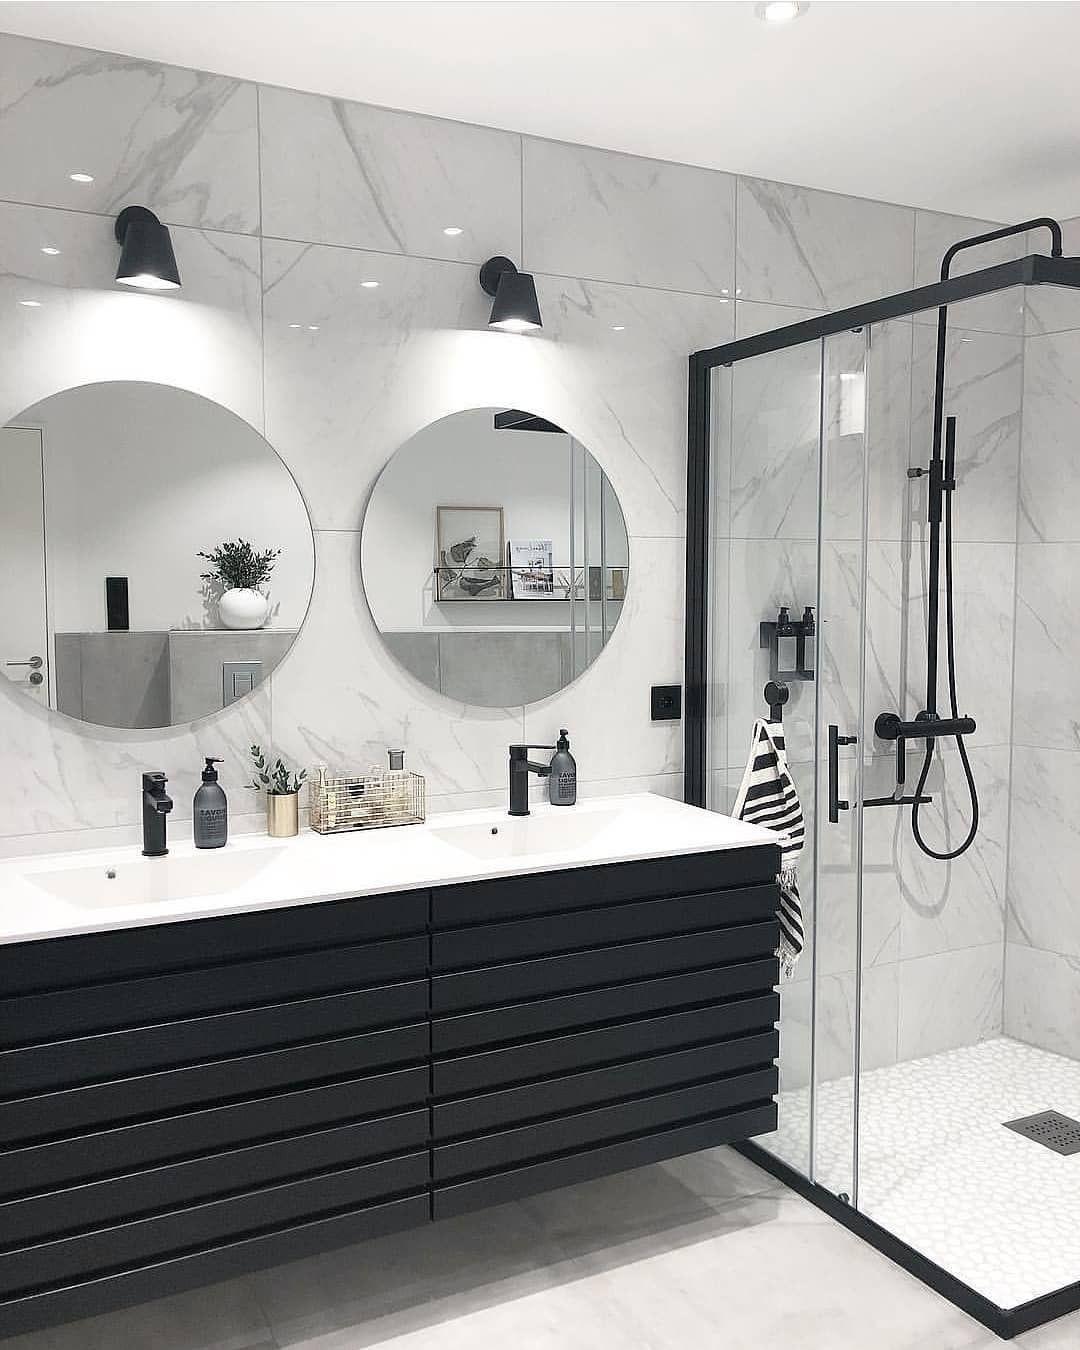 Rorkjop No On Instagram I Kveld Deler Vi Det Lekre Badet Til Boogreis Med Onske Om En Riktig Round Mirror Bathroom Black Vanity Bathroom Bathroom Mirror